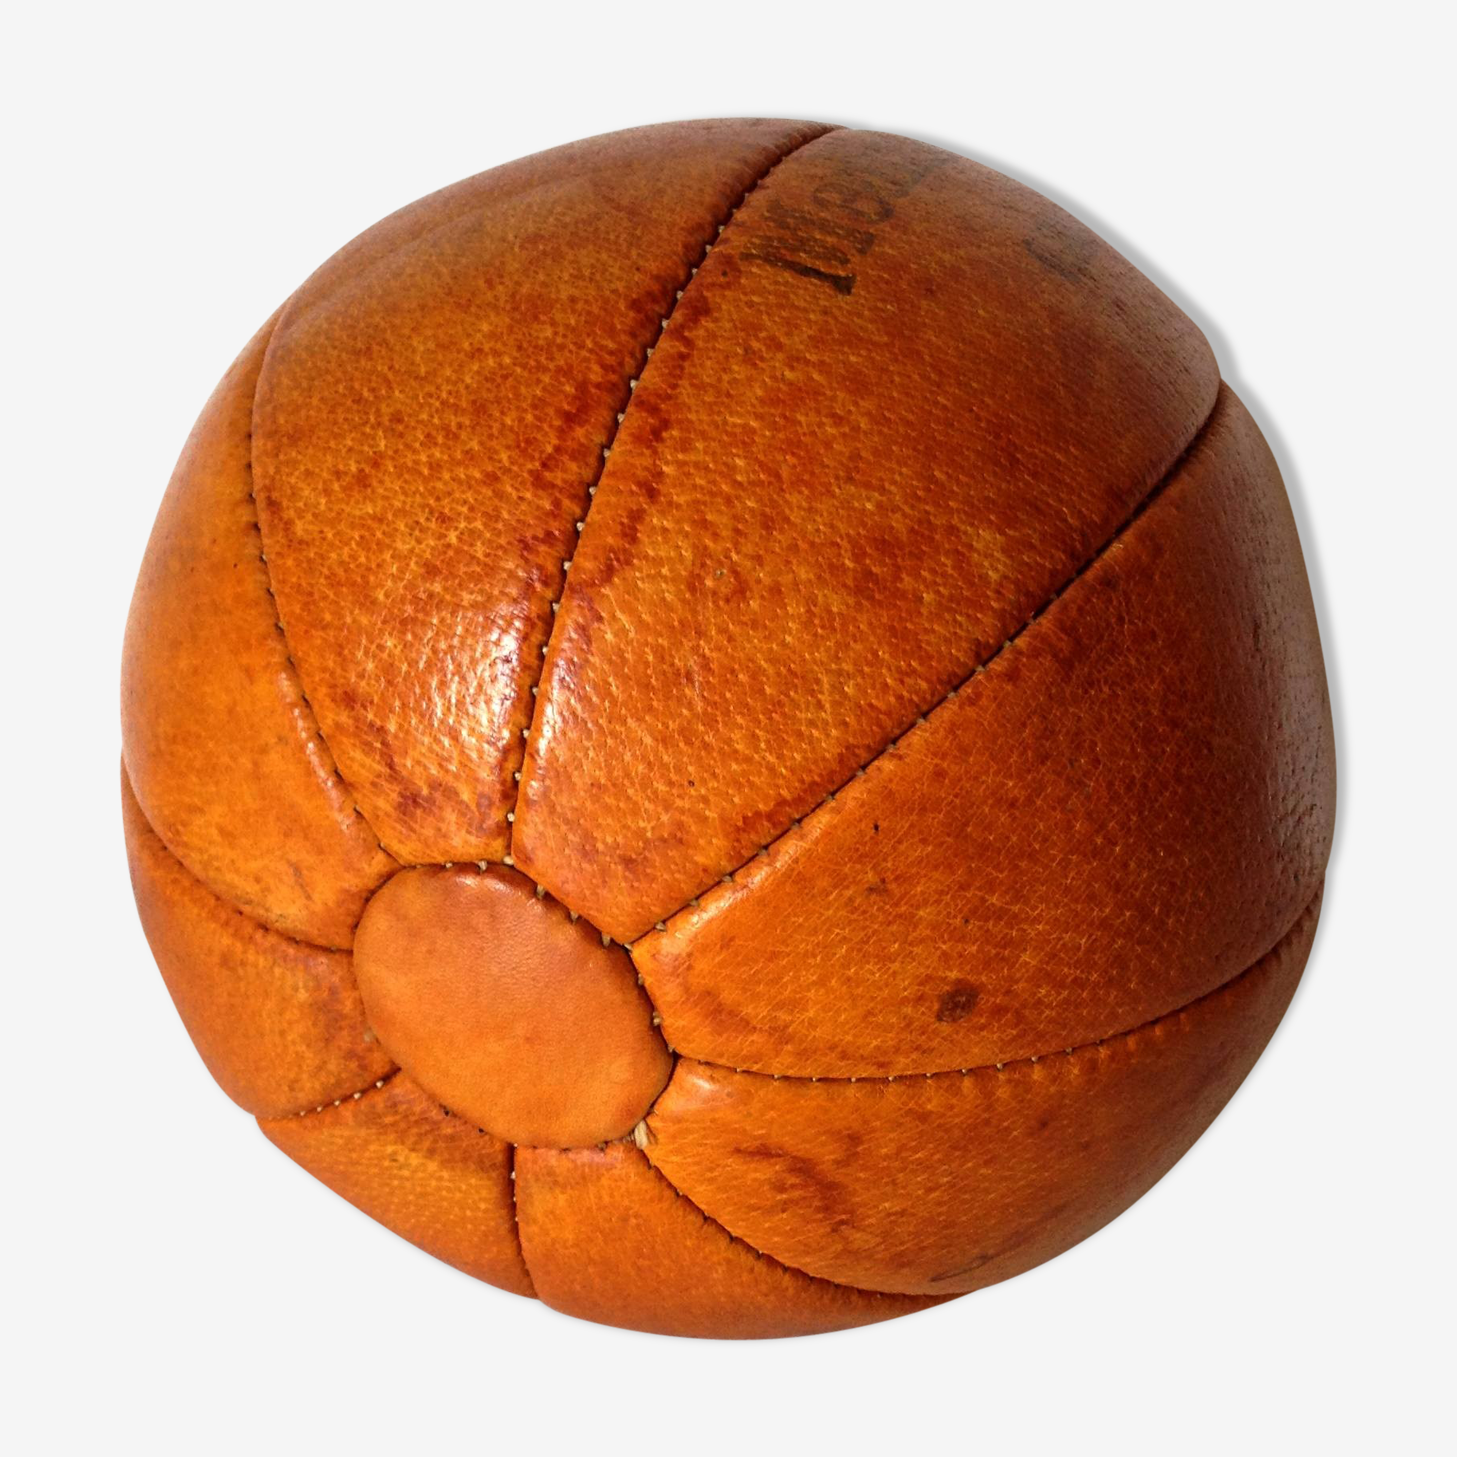 Ball vintage leather